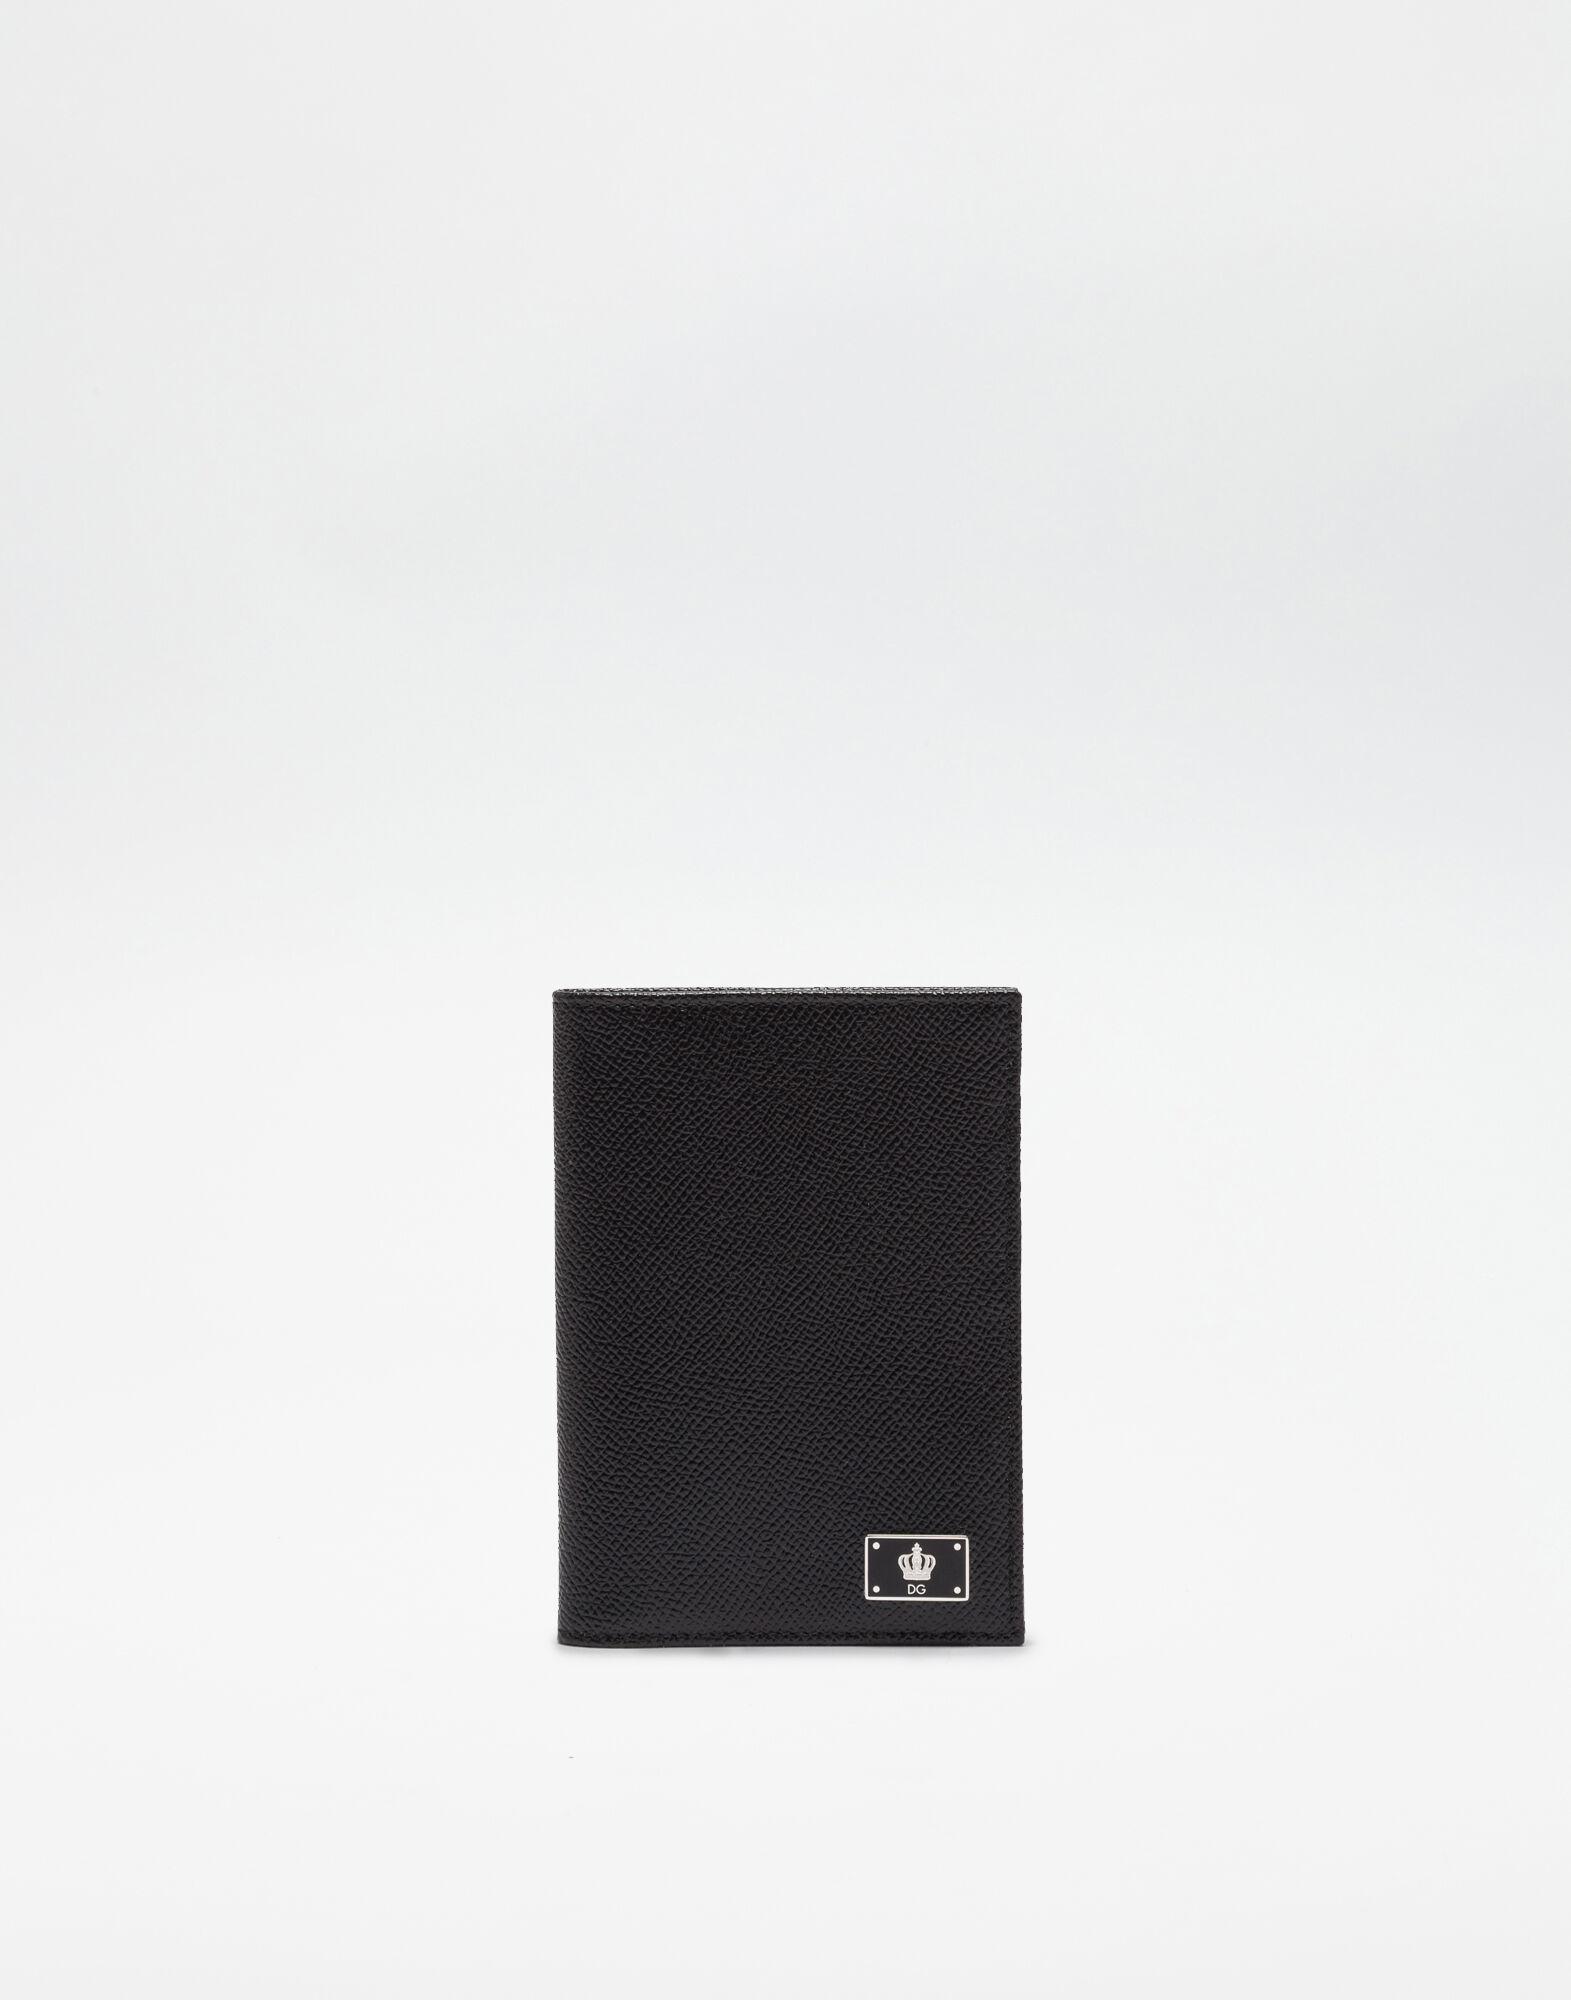 DAUPHINE LEATHER PASSPORT HOLDER